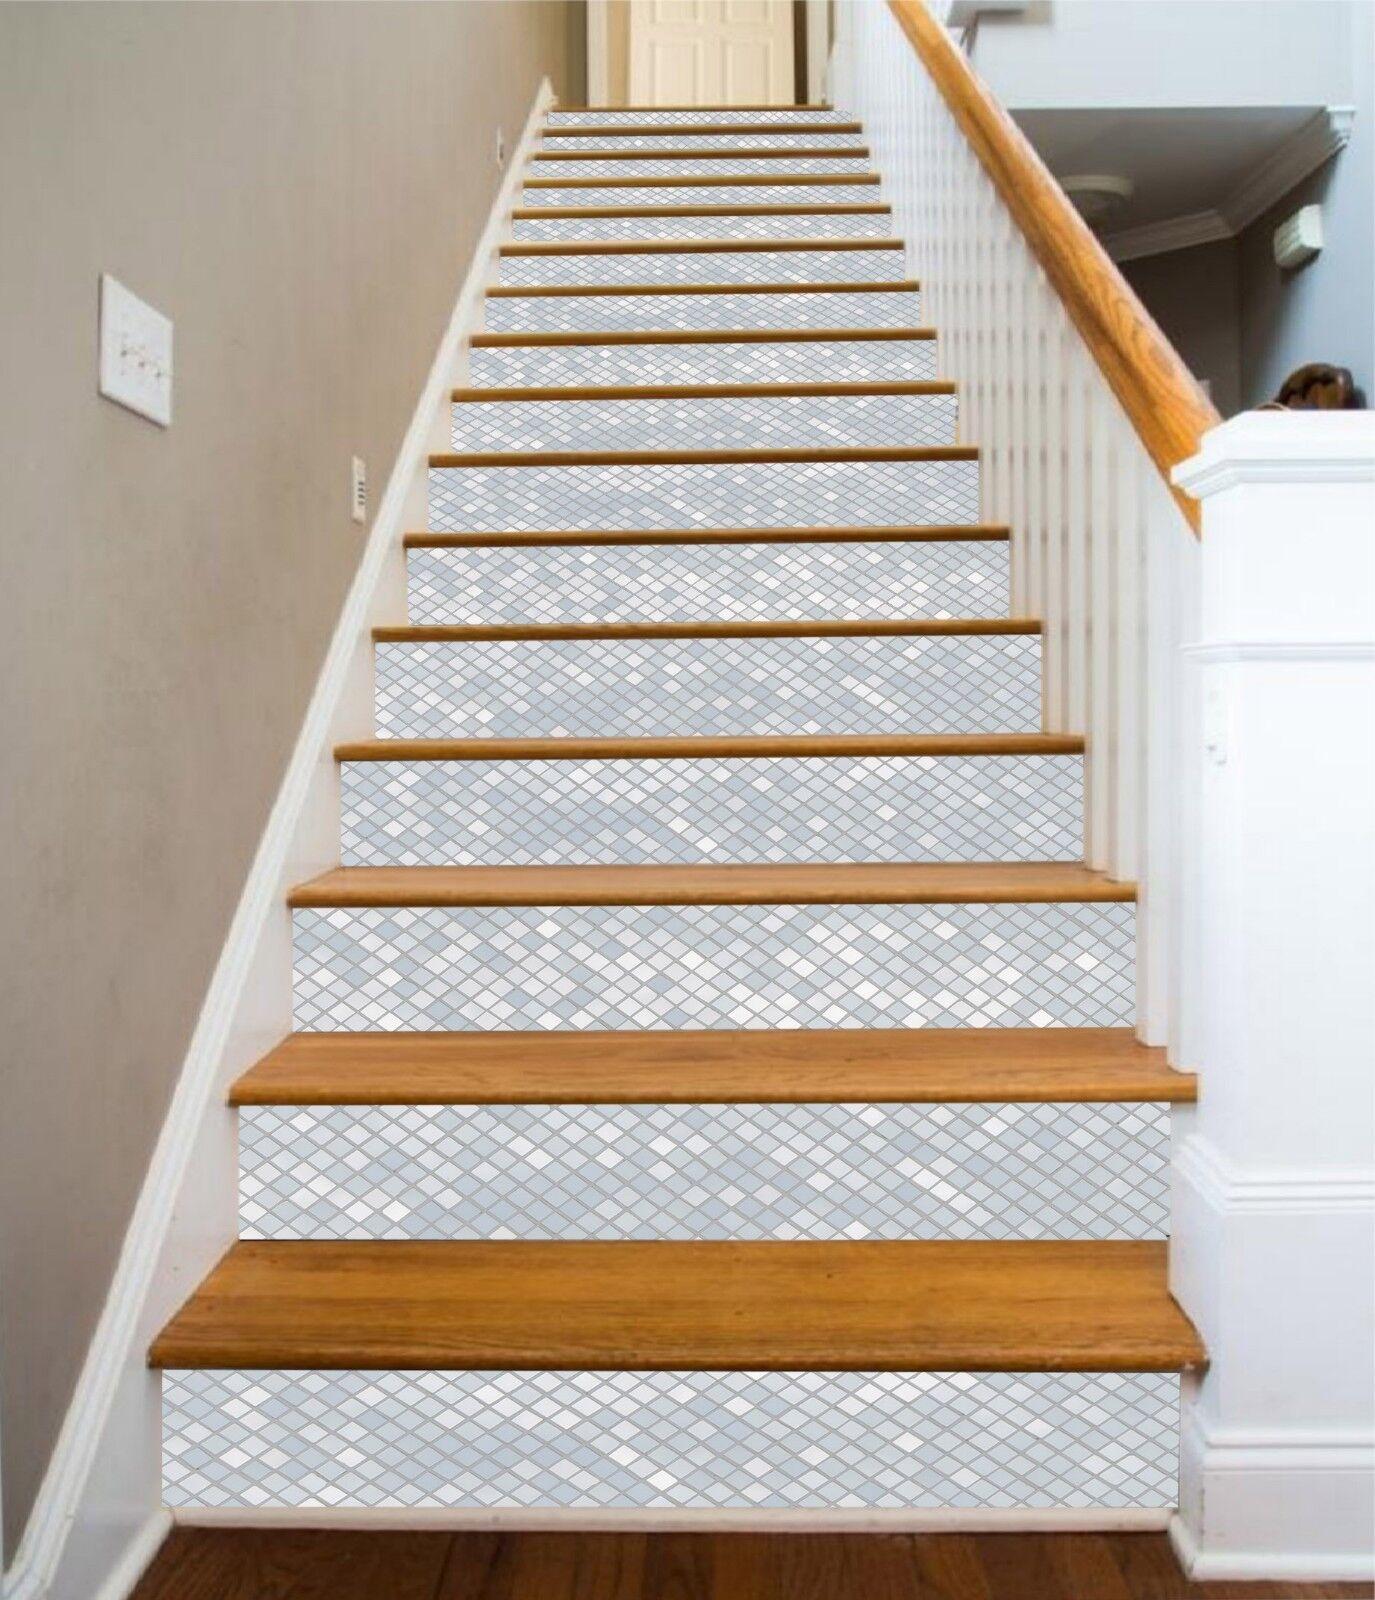 3D Gradient Stein 7 Fliese Marmor Stair Risers Fototapete Vinyl Aufkleber Tapete